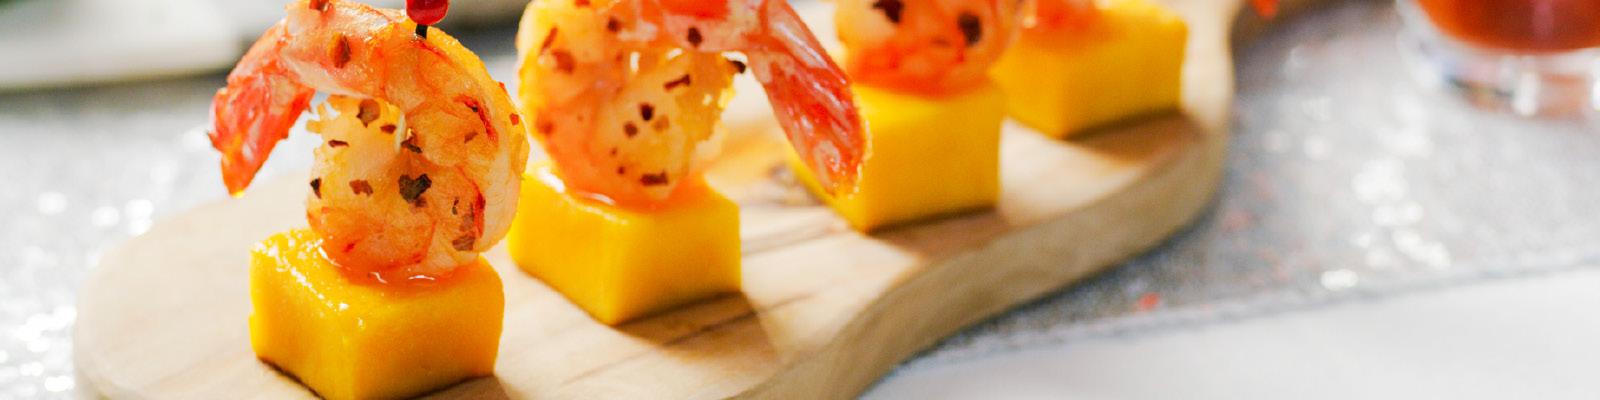 1600x400-Recipe-Spicy-Prawn-Mango-Tapas-1-2.jpg